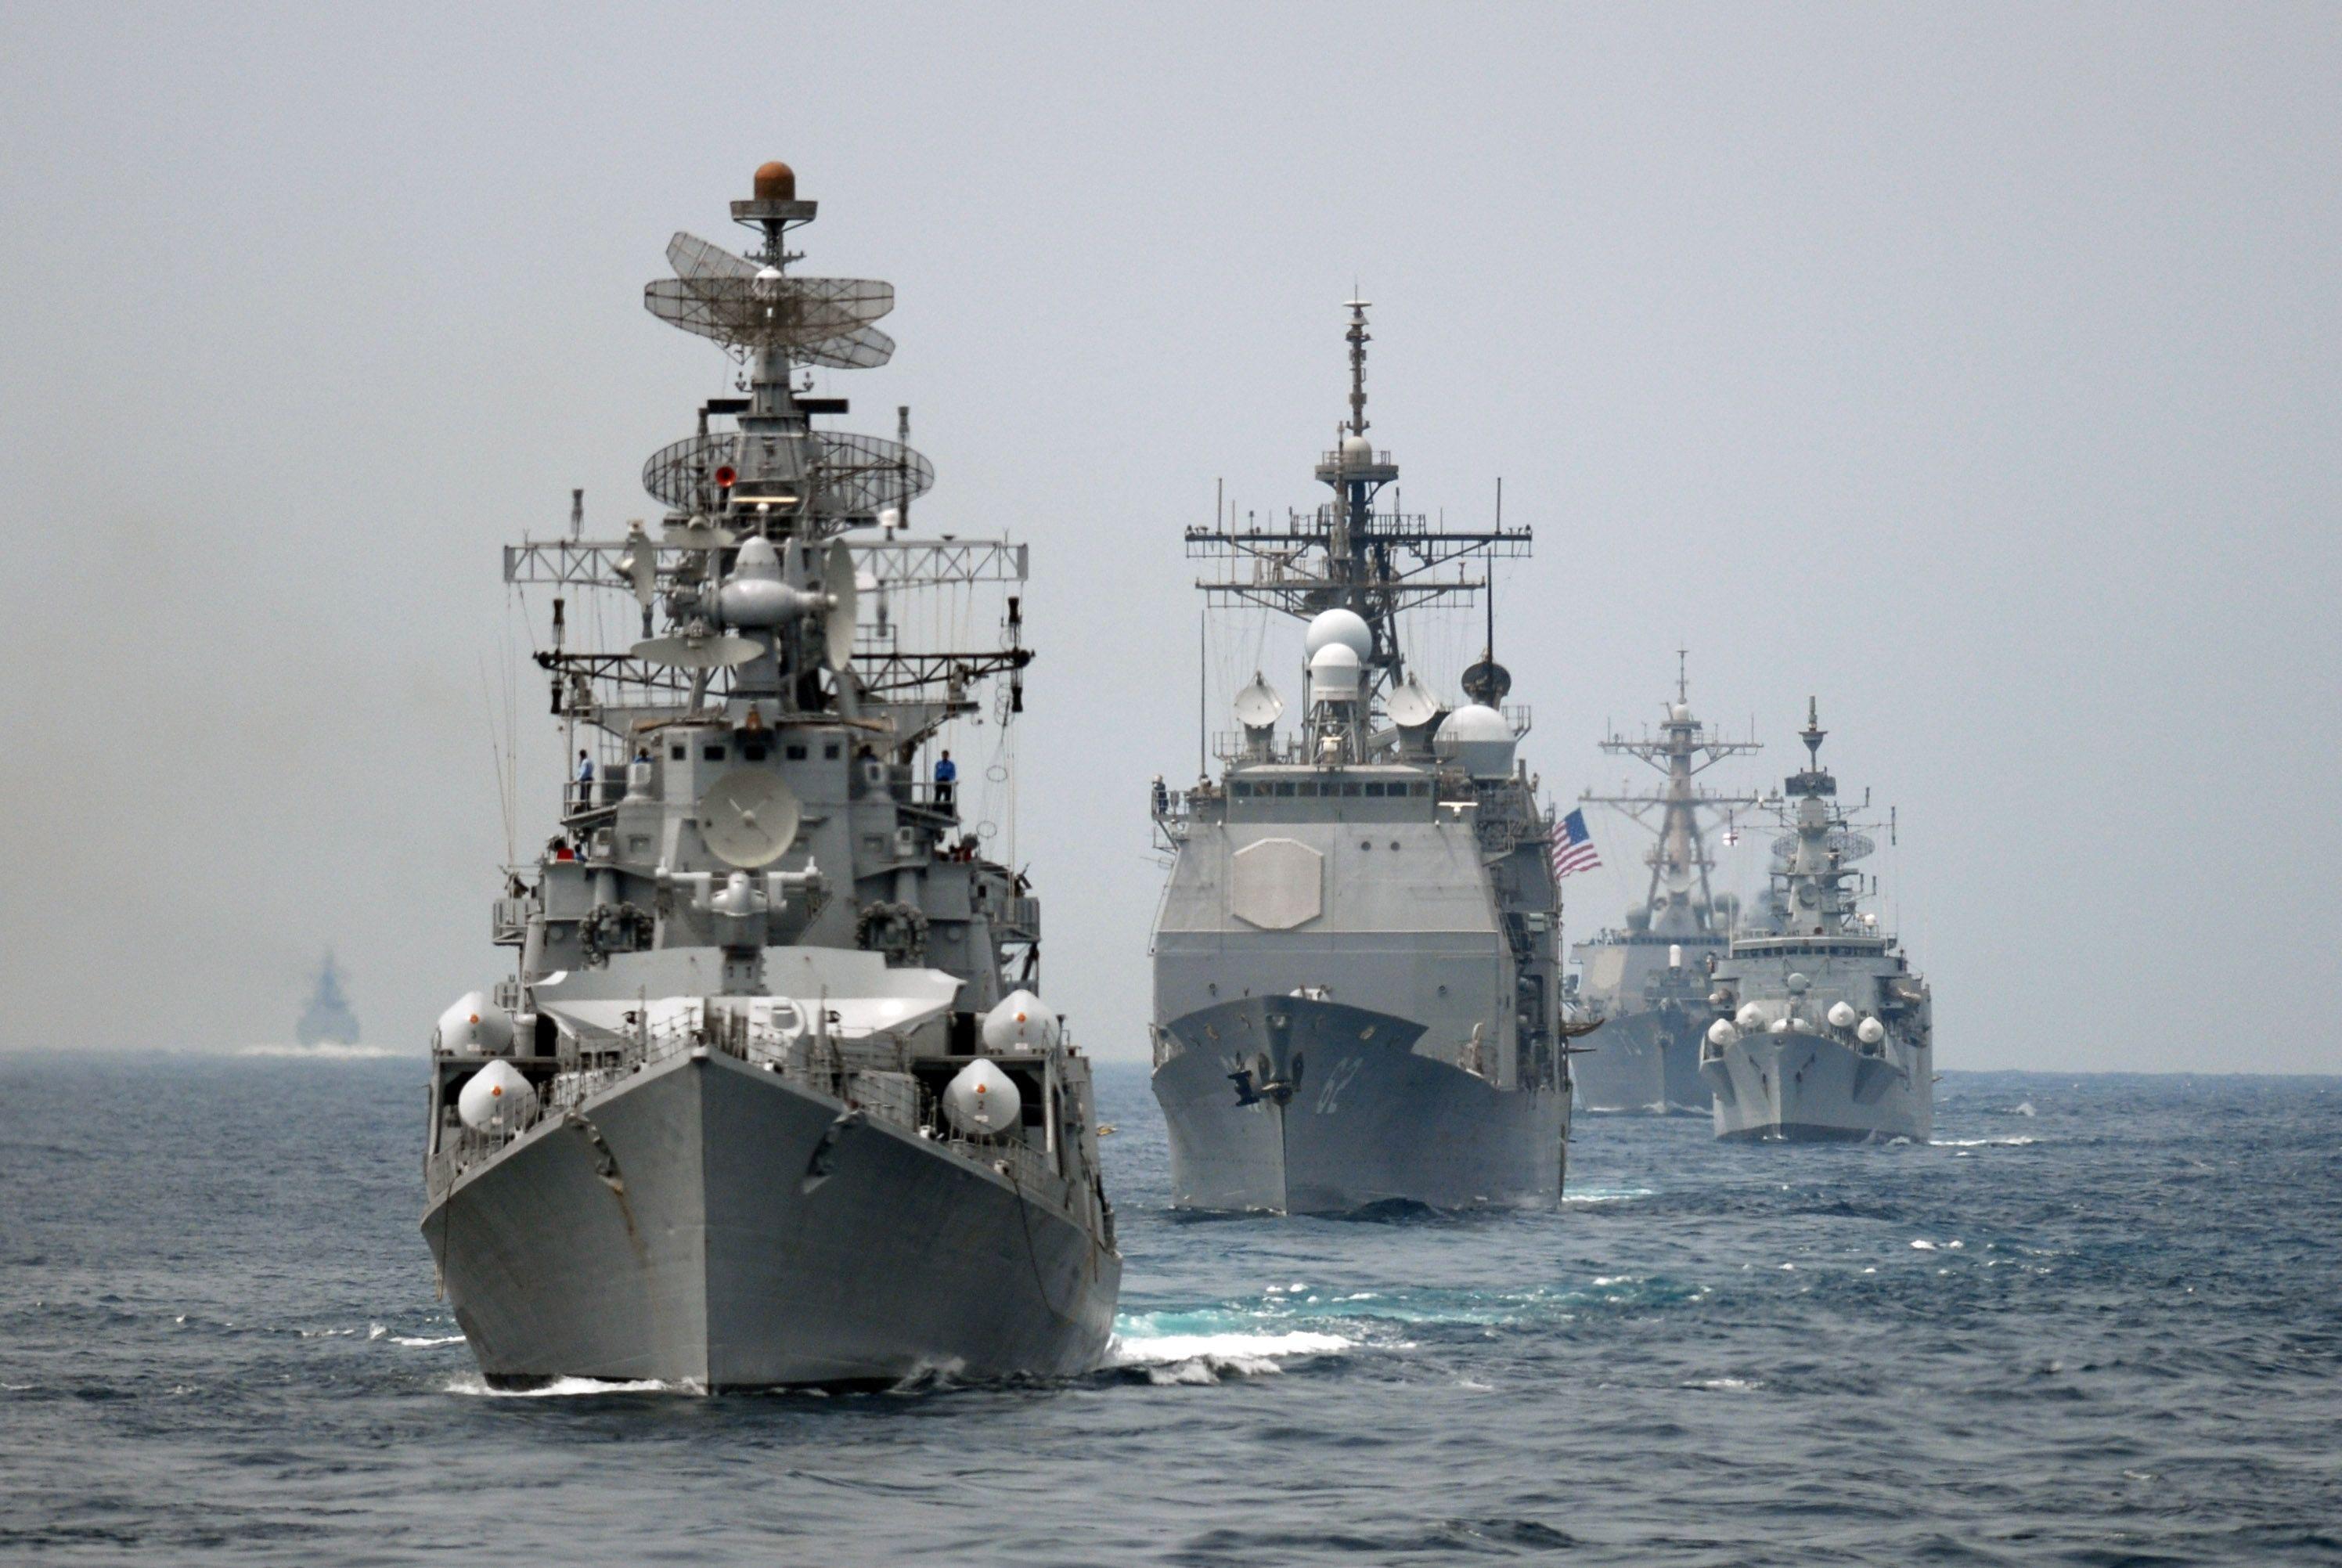 navy wallpaper 1440x900 ships - photo #31